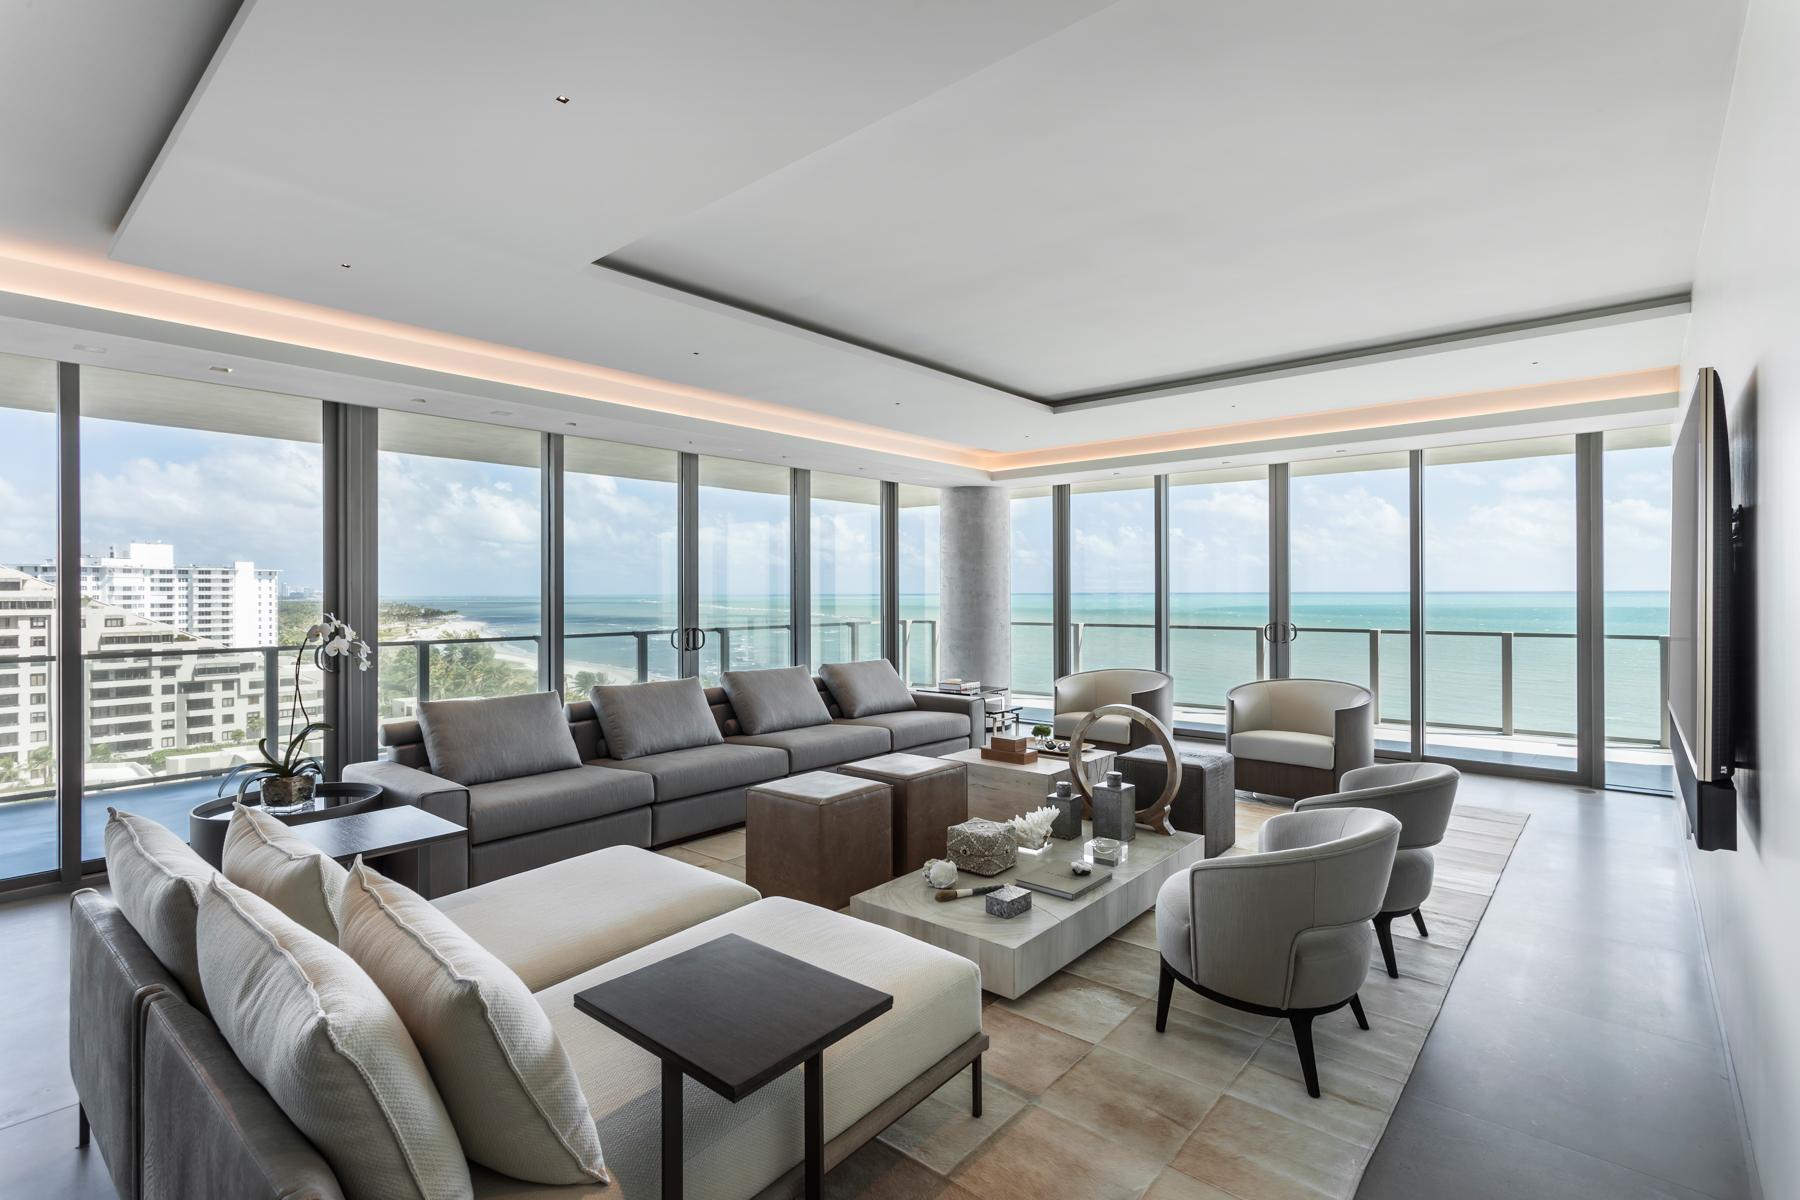 Oceana Residence by Guimar Urbina